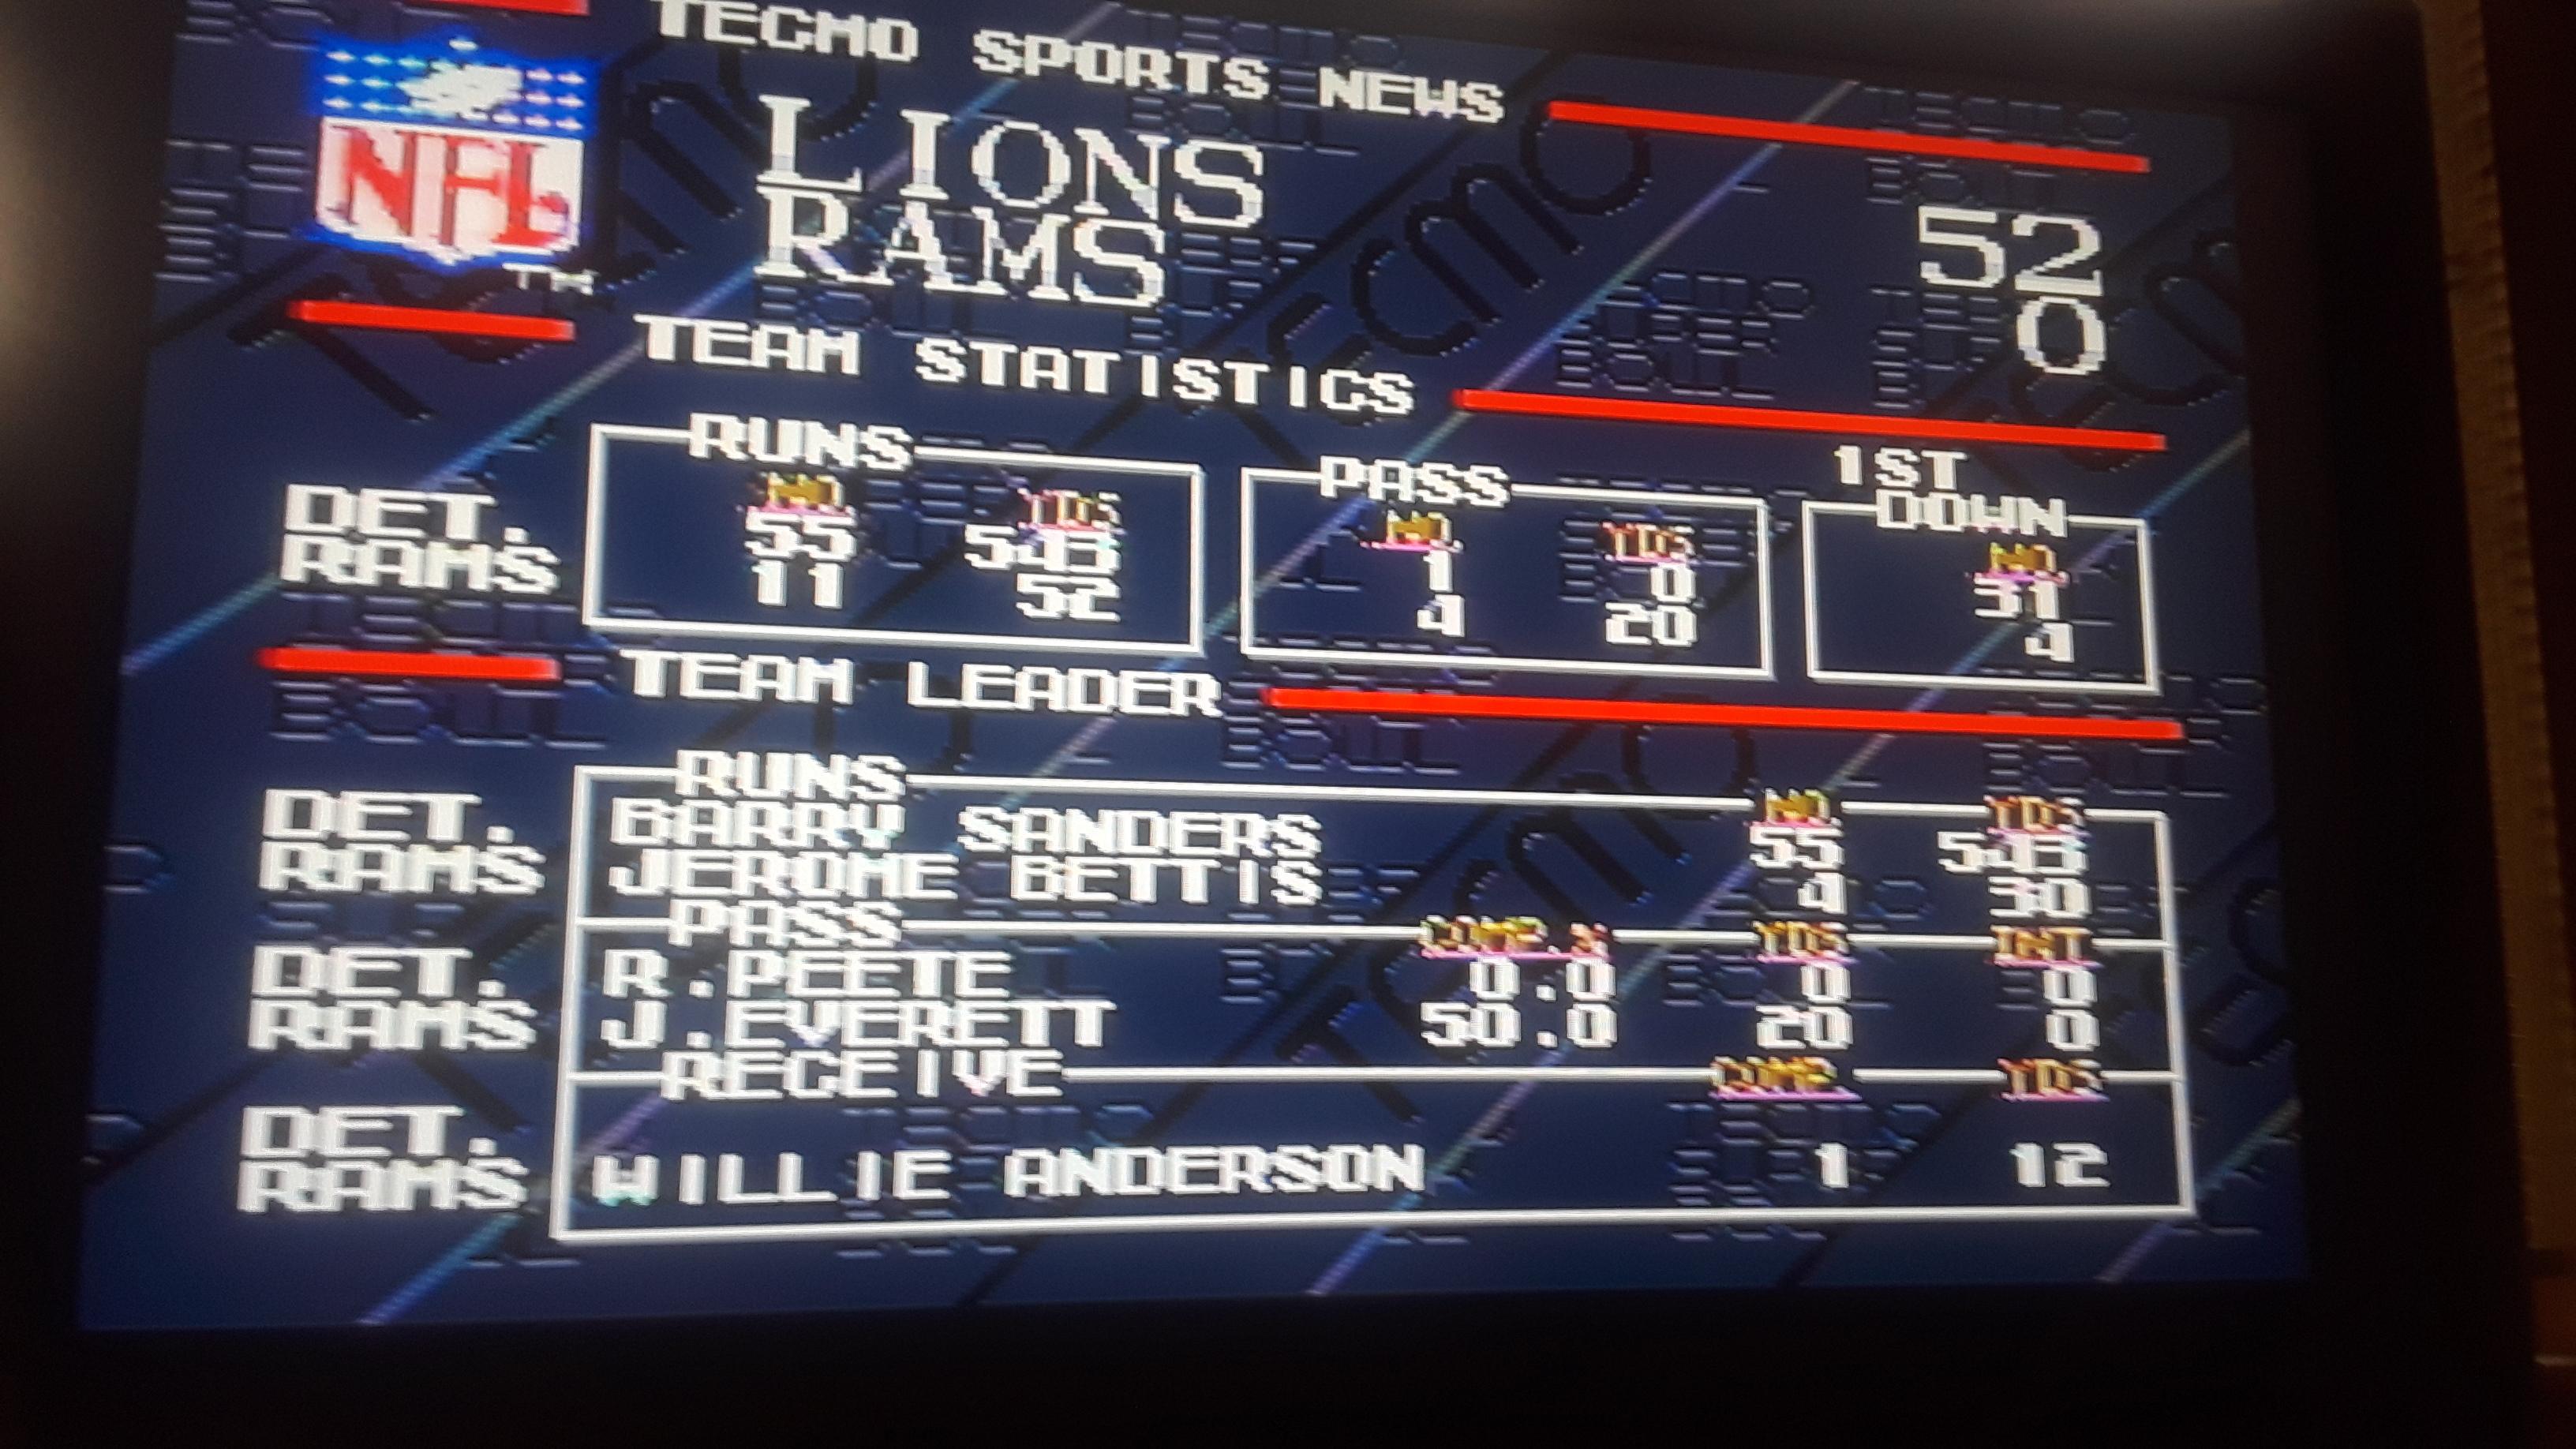 JML101582: Tecmo Super Bowl [Most 1st Downs] [Preseason Game] (Sega Genesis / MegaDrive Emulated) 31 points on 2019-09-05 19:19:33